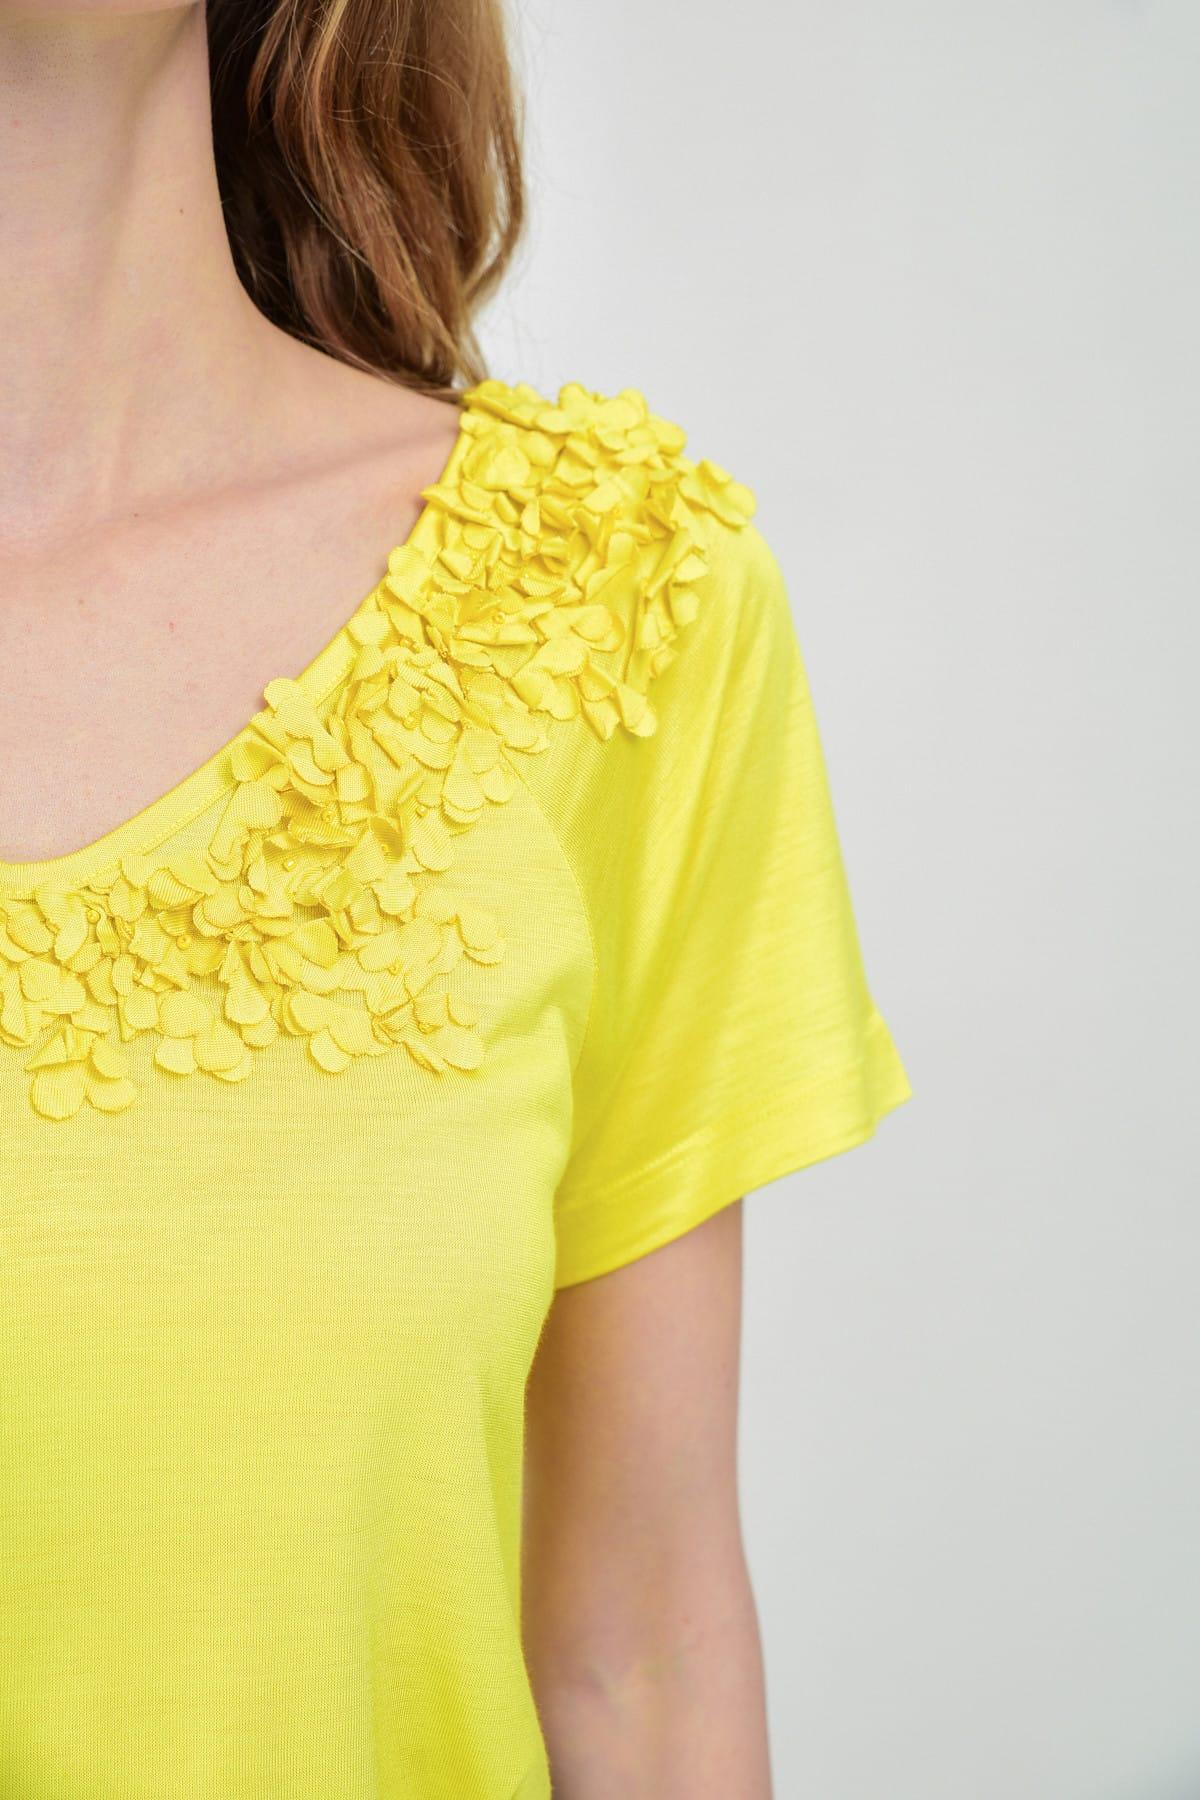 Hanna's by Hanna Darsa Kadın Sarı Çiçek Detaylı Kısa Kollu T-Shirt Hn1489 2